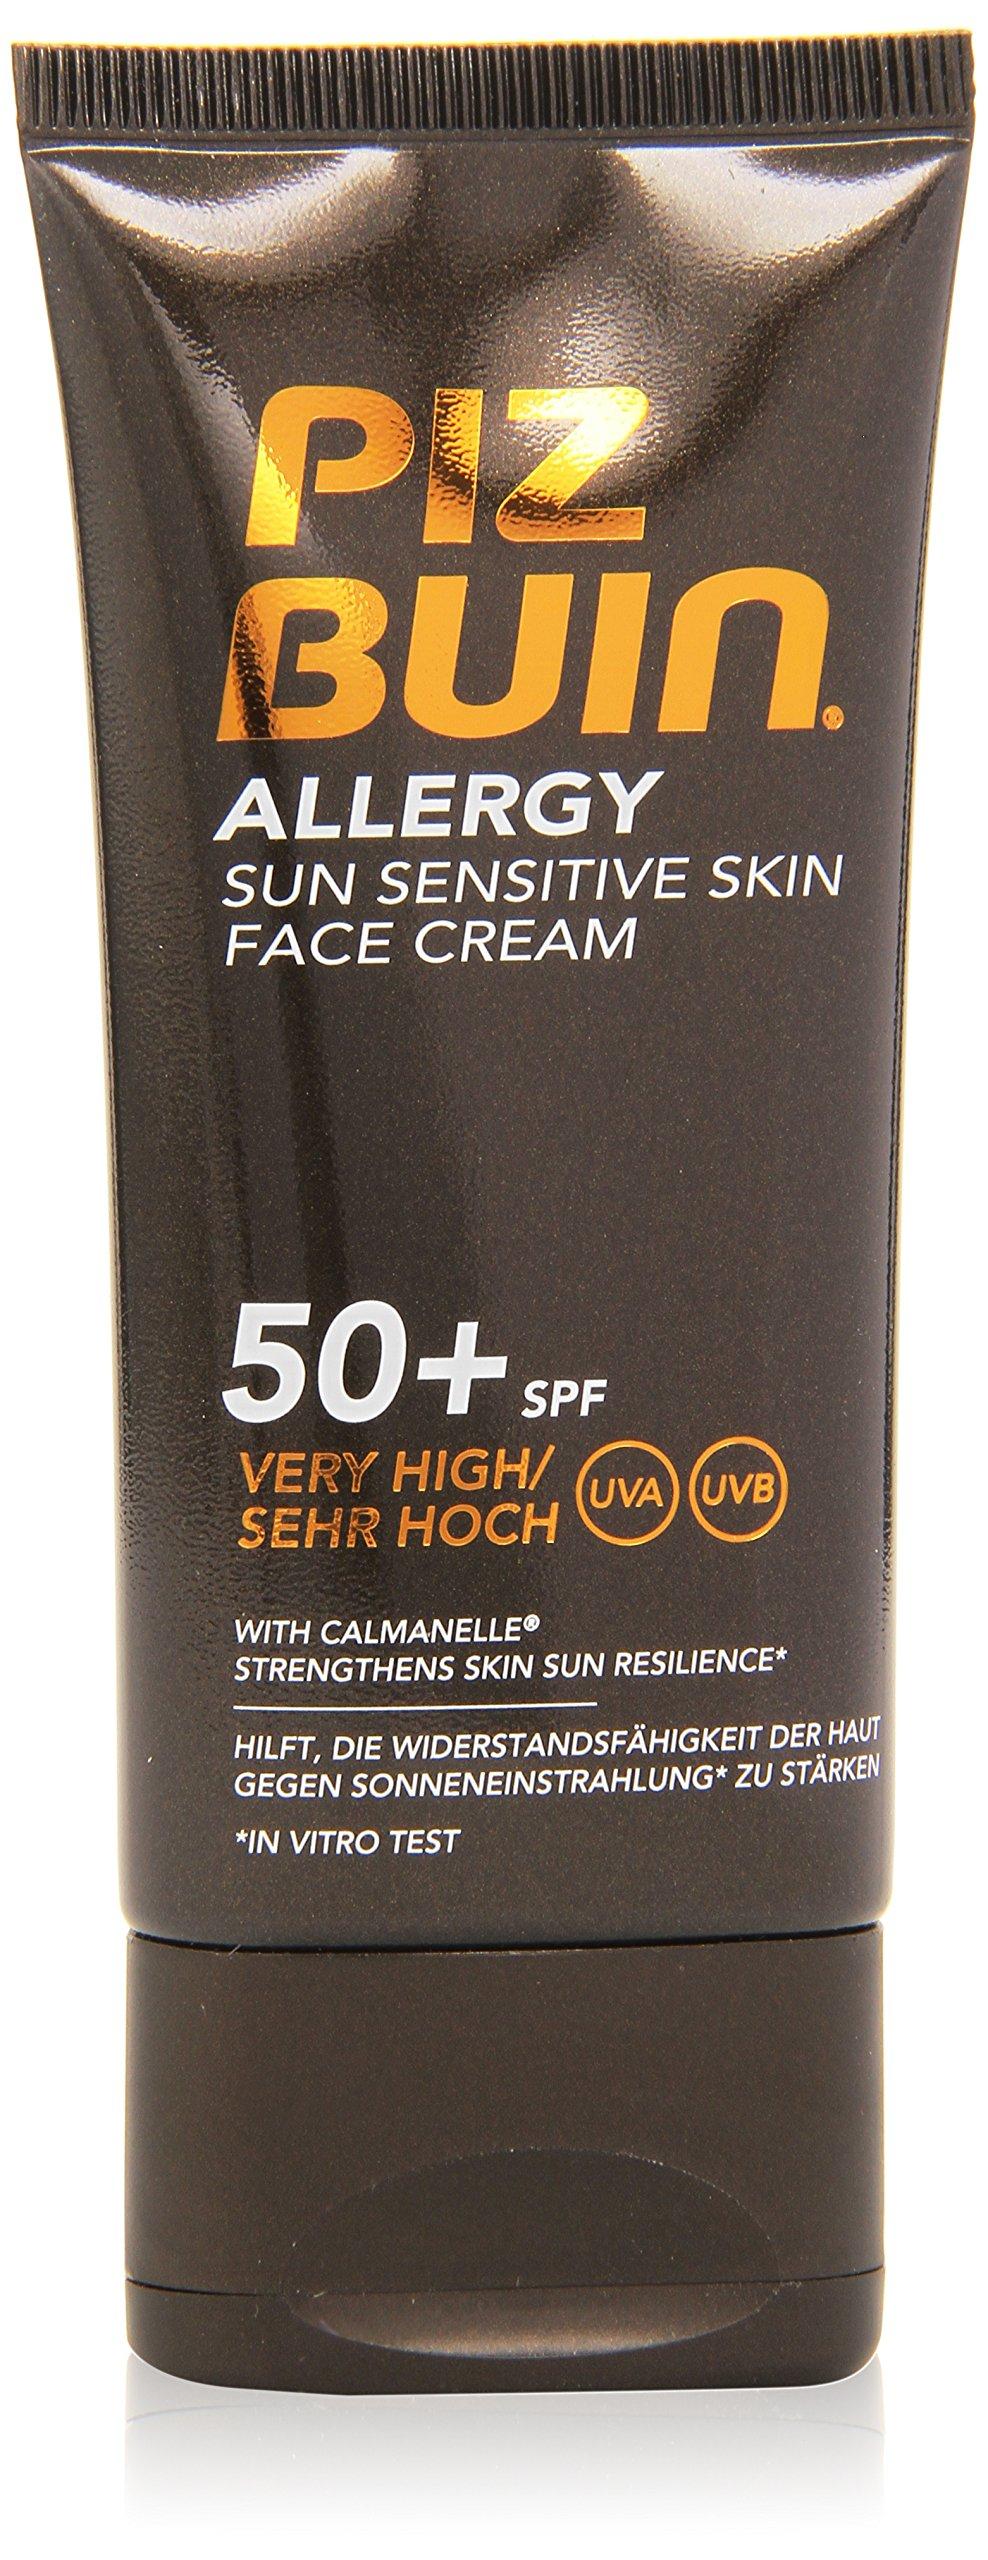 Piz Buin Allergy Crema Viso Fp50+ 50Ml